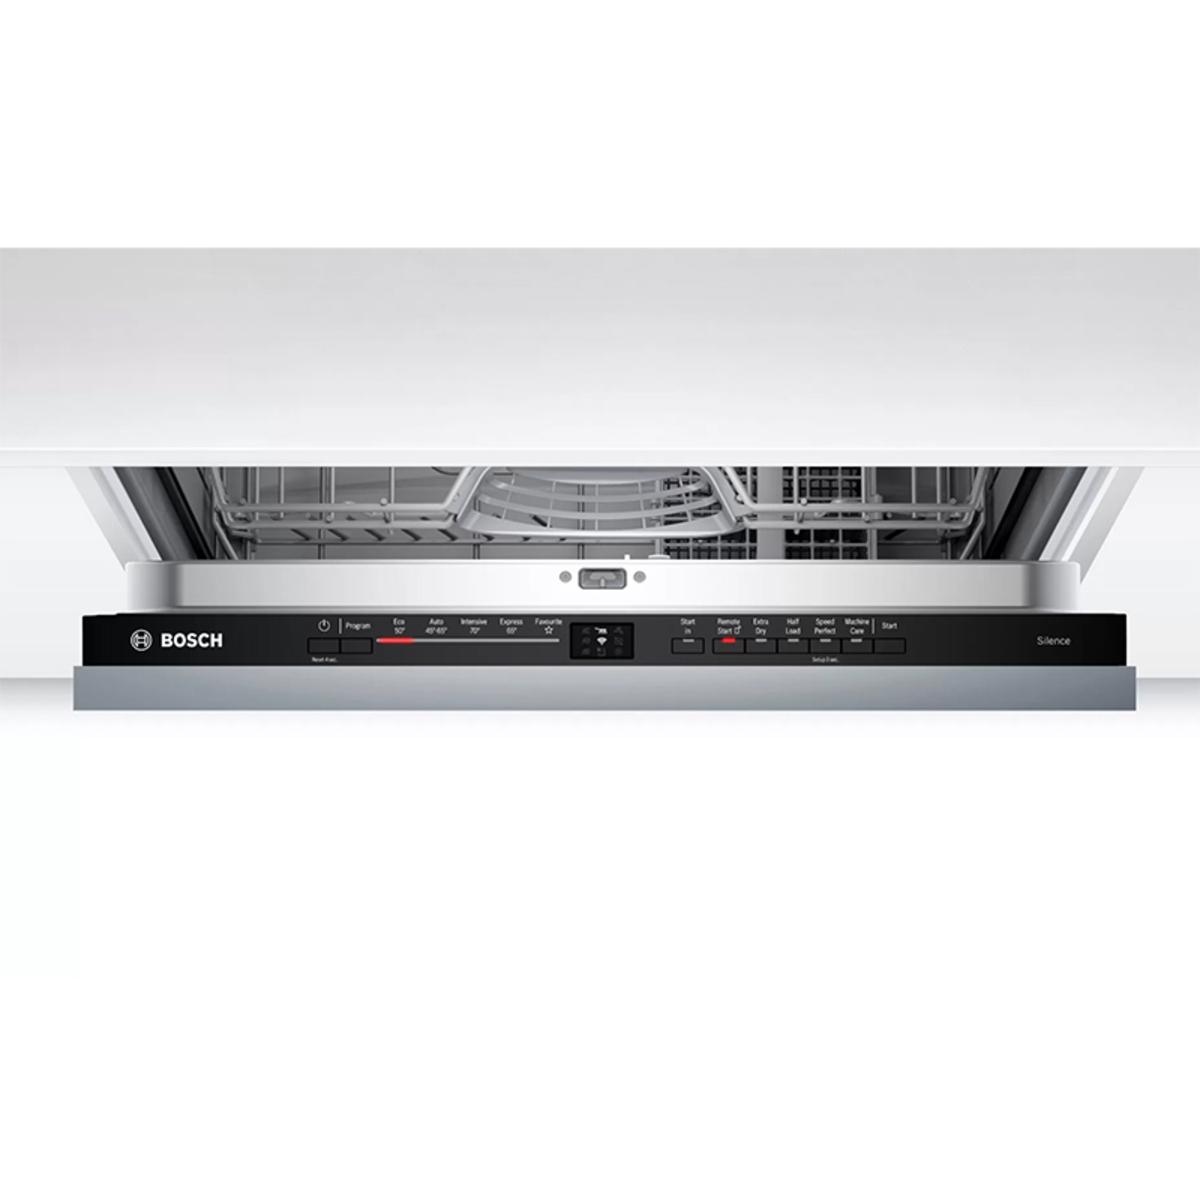 Bosch SGV2ITX18G Serie 2 60cm Fully-integrated dishwasher